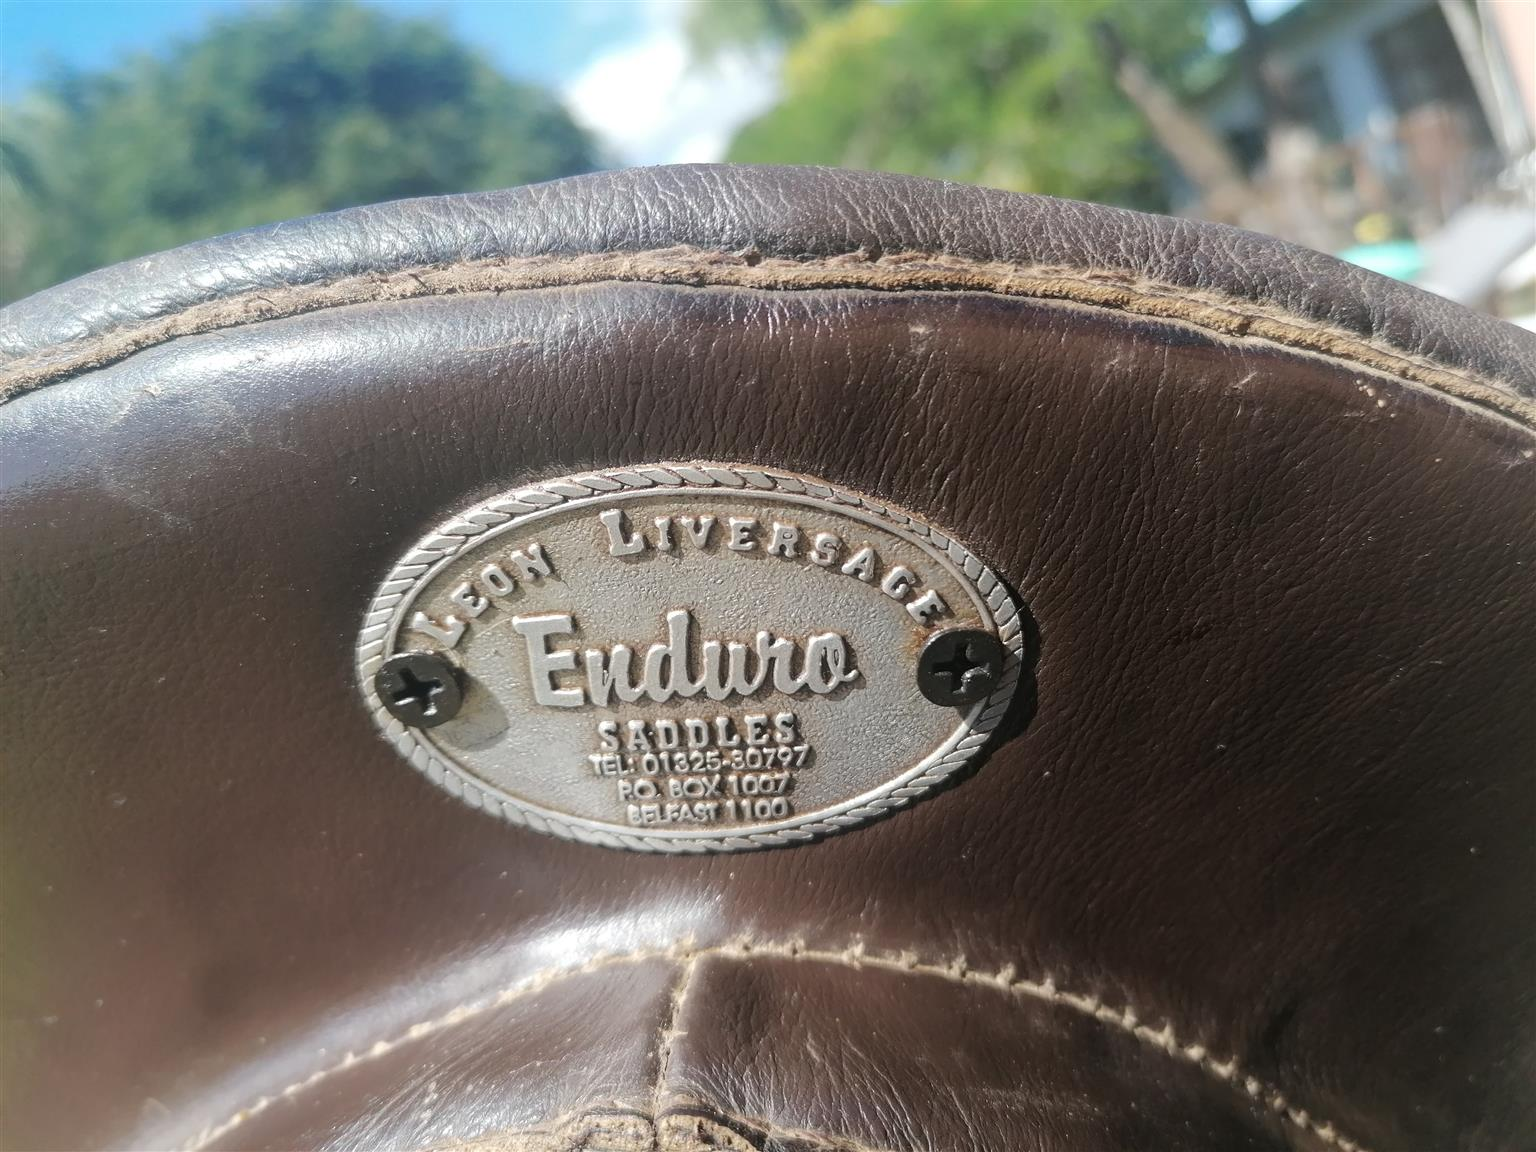 Leon liversage enduro saddle